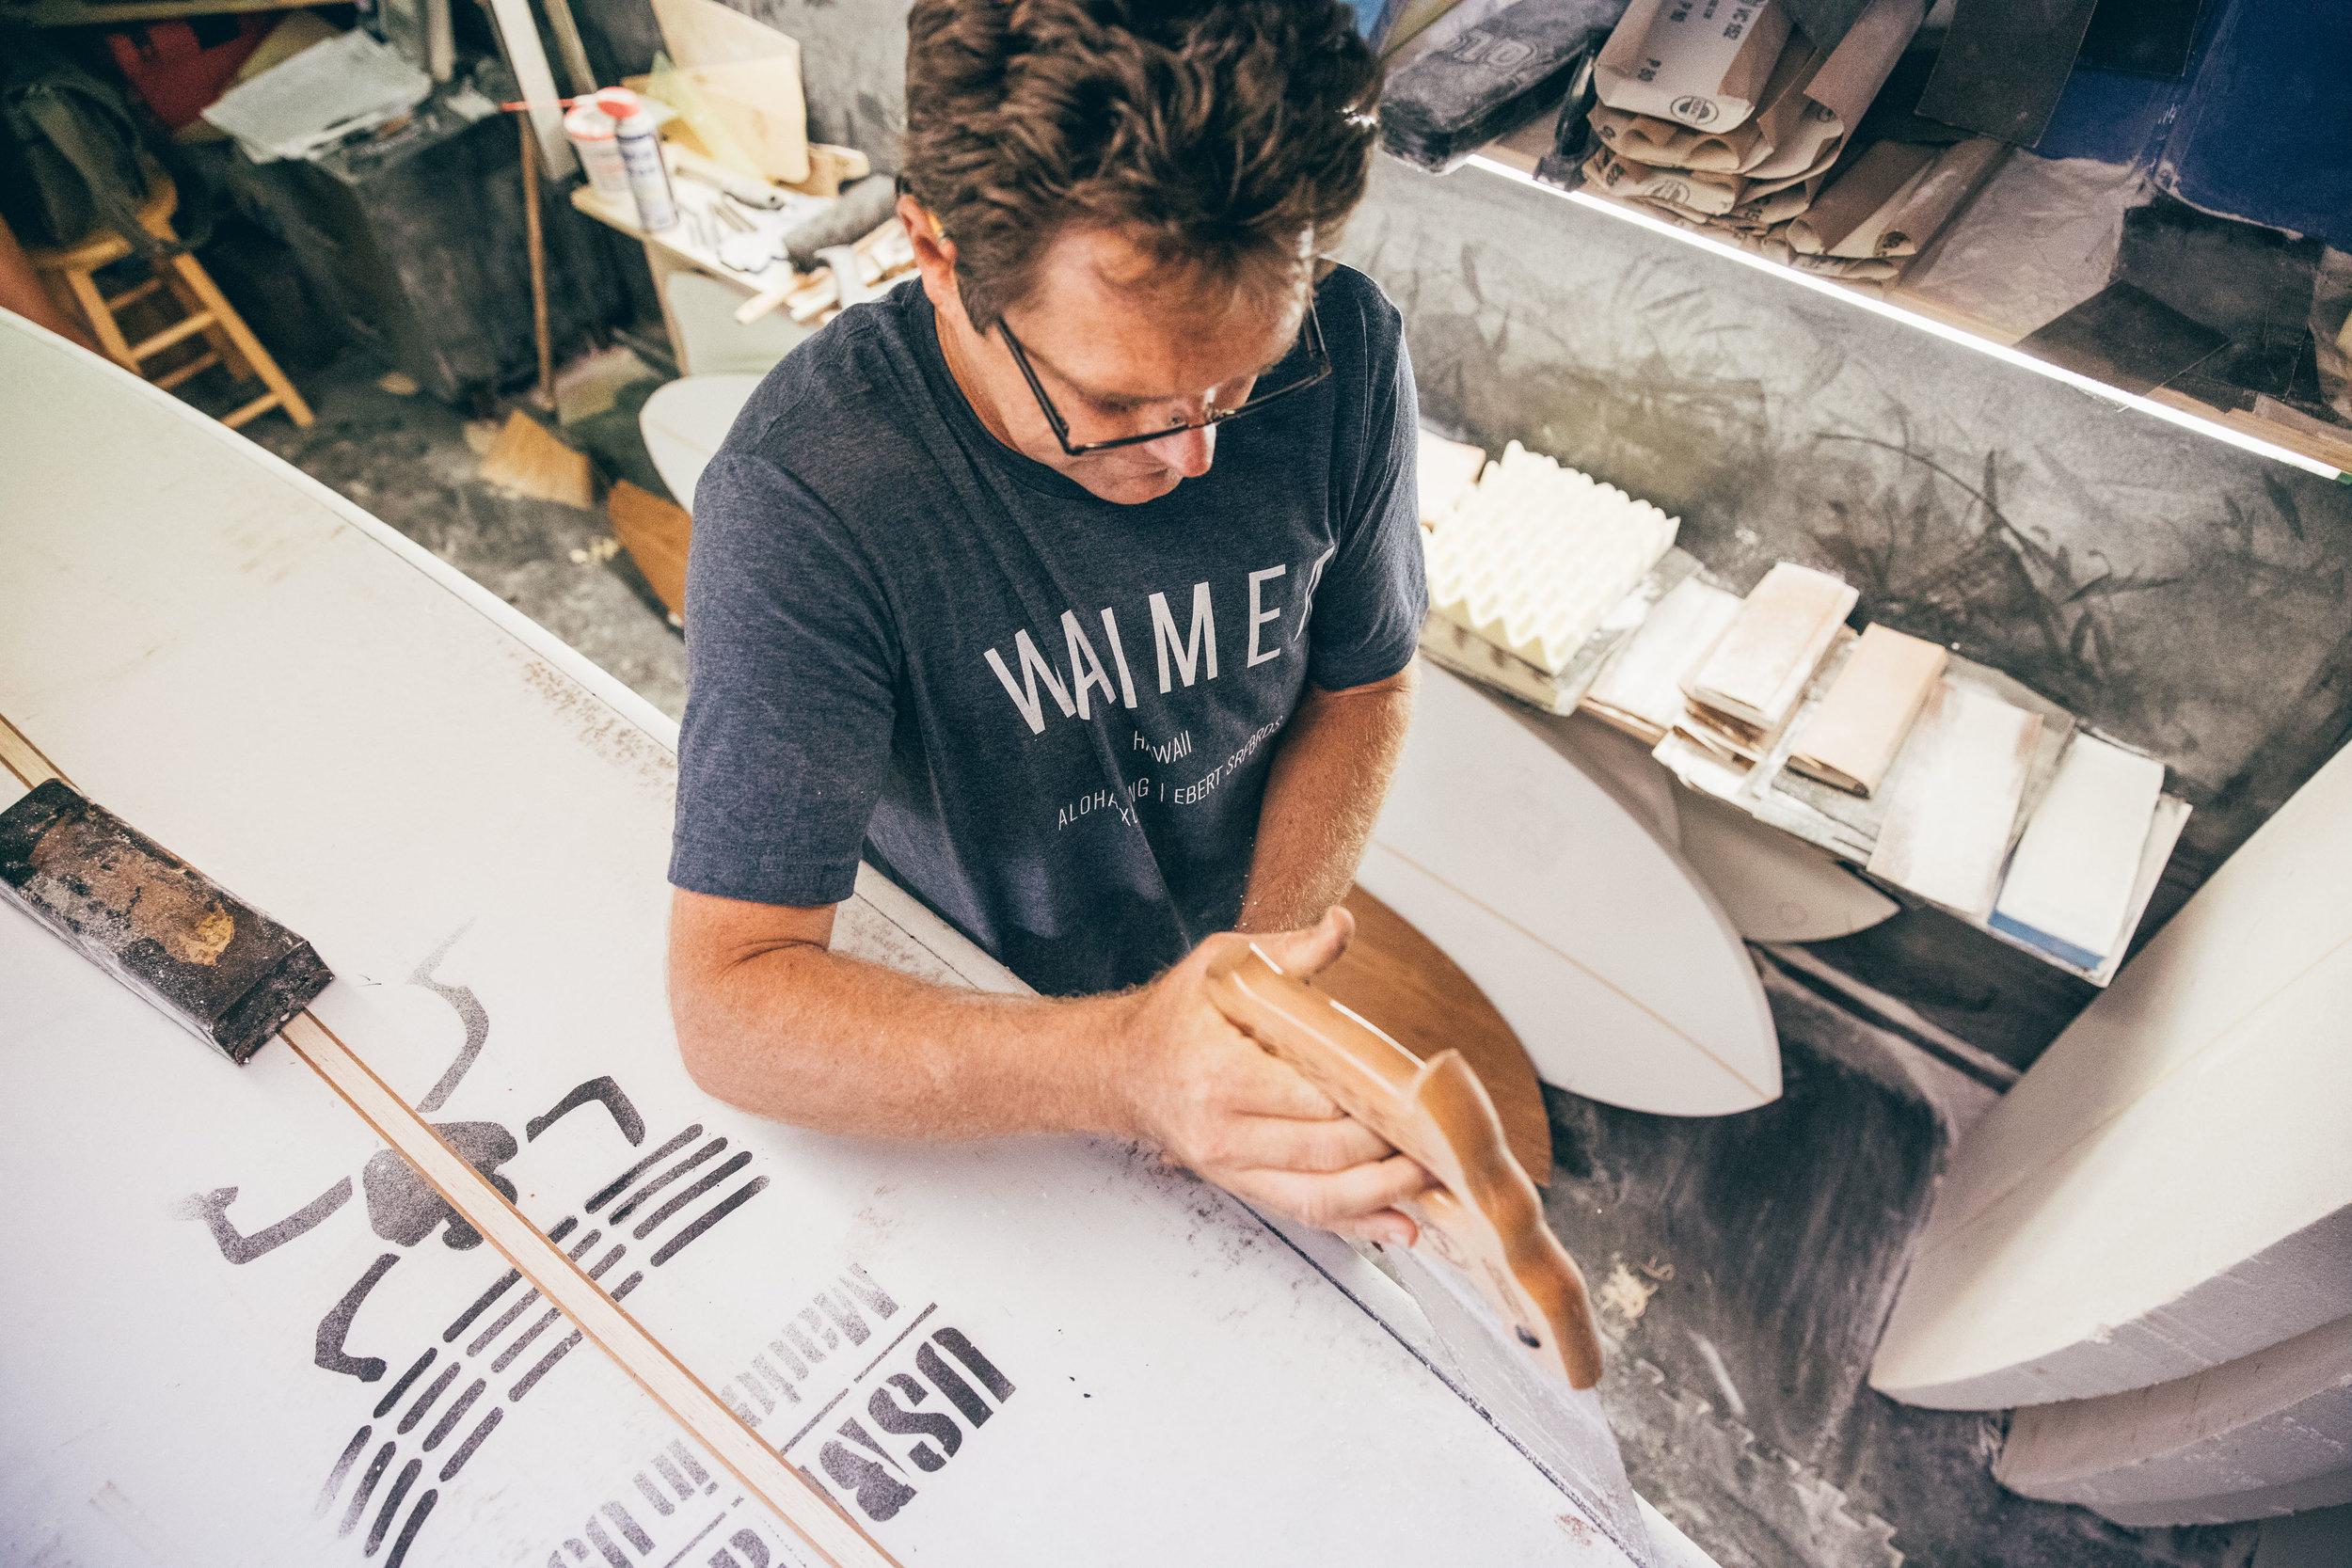 bryce johnson-photography-ebert surfboards-kauai-19.jpg